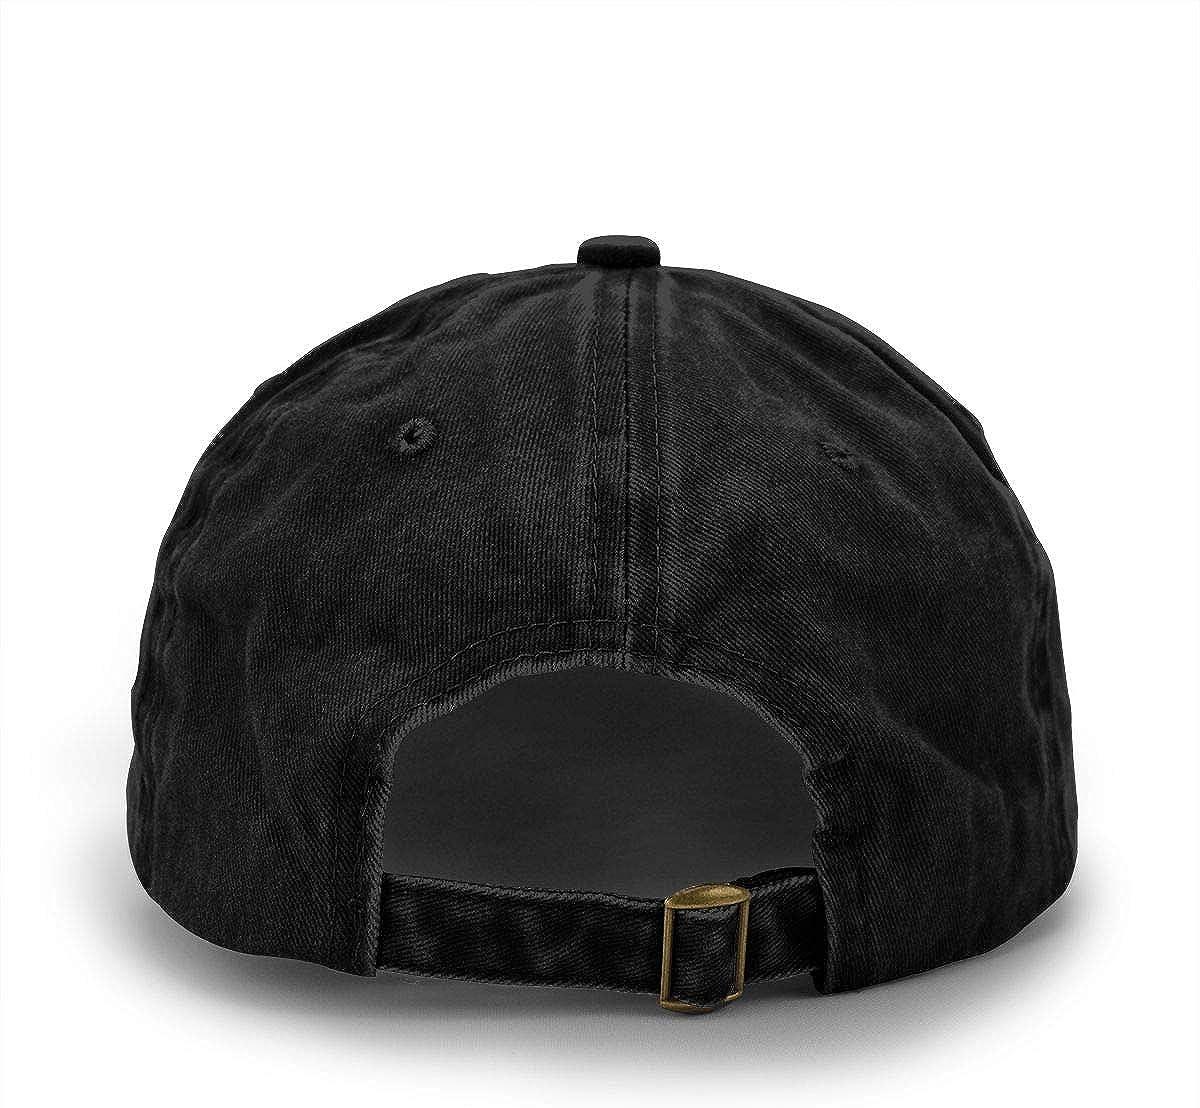 Fresh Prince Reloaded Classic Unisex Adult Adjustable Denim Hats Black